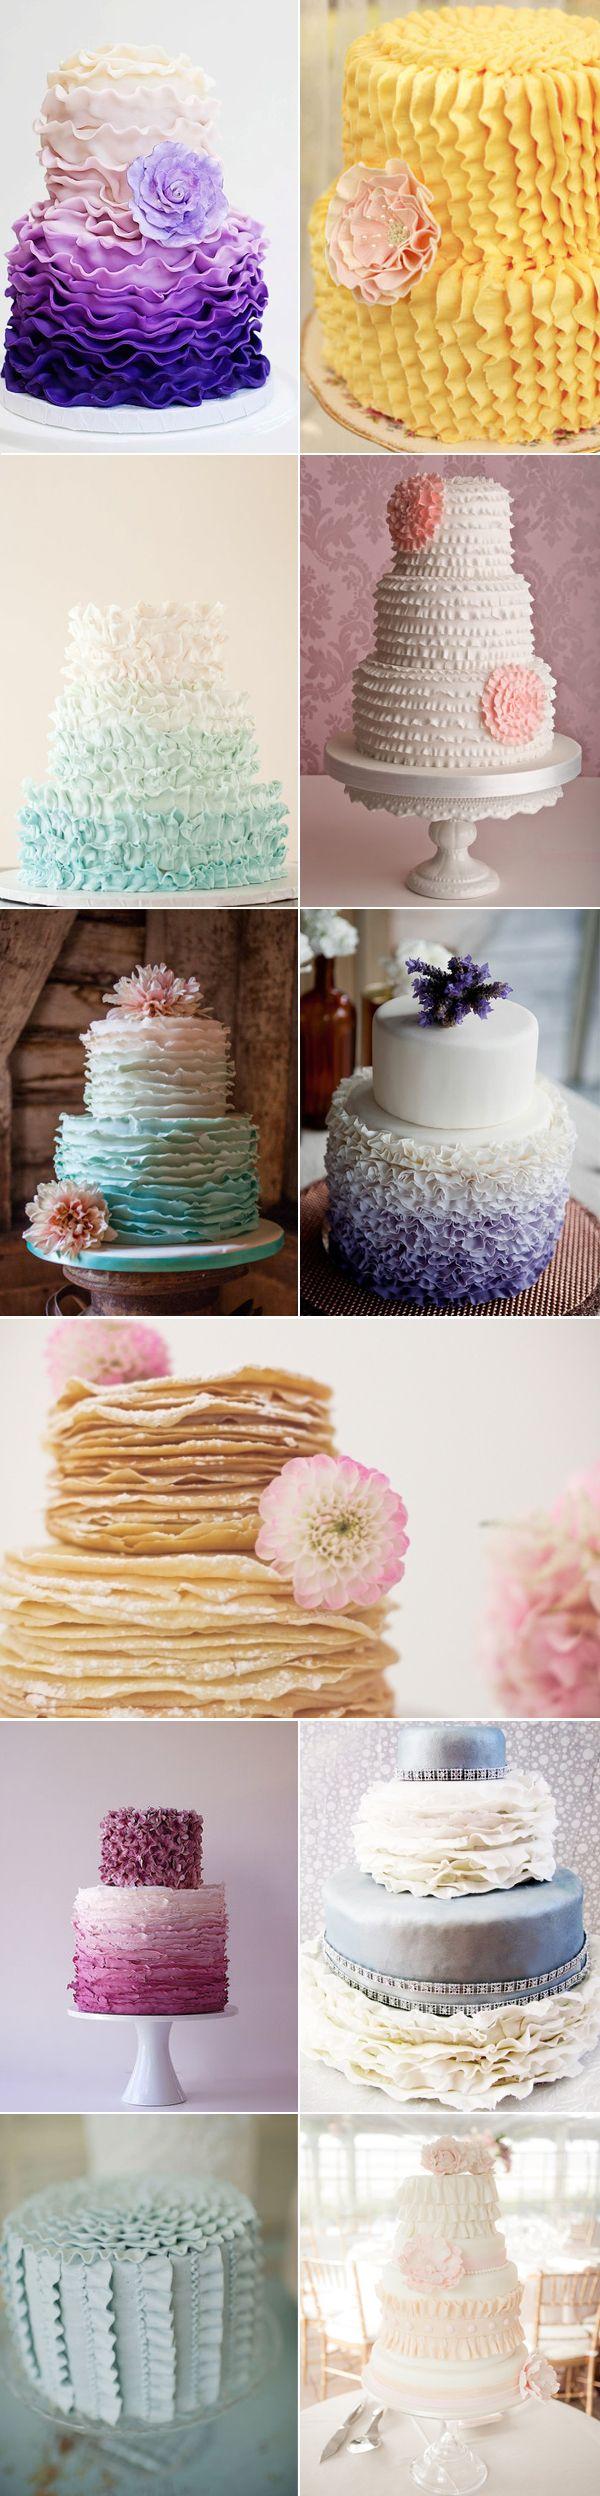 ruffle_cakes